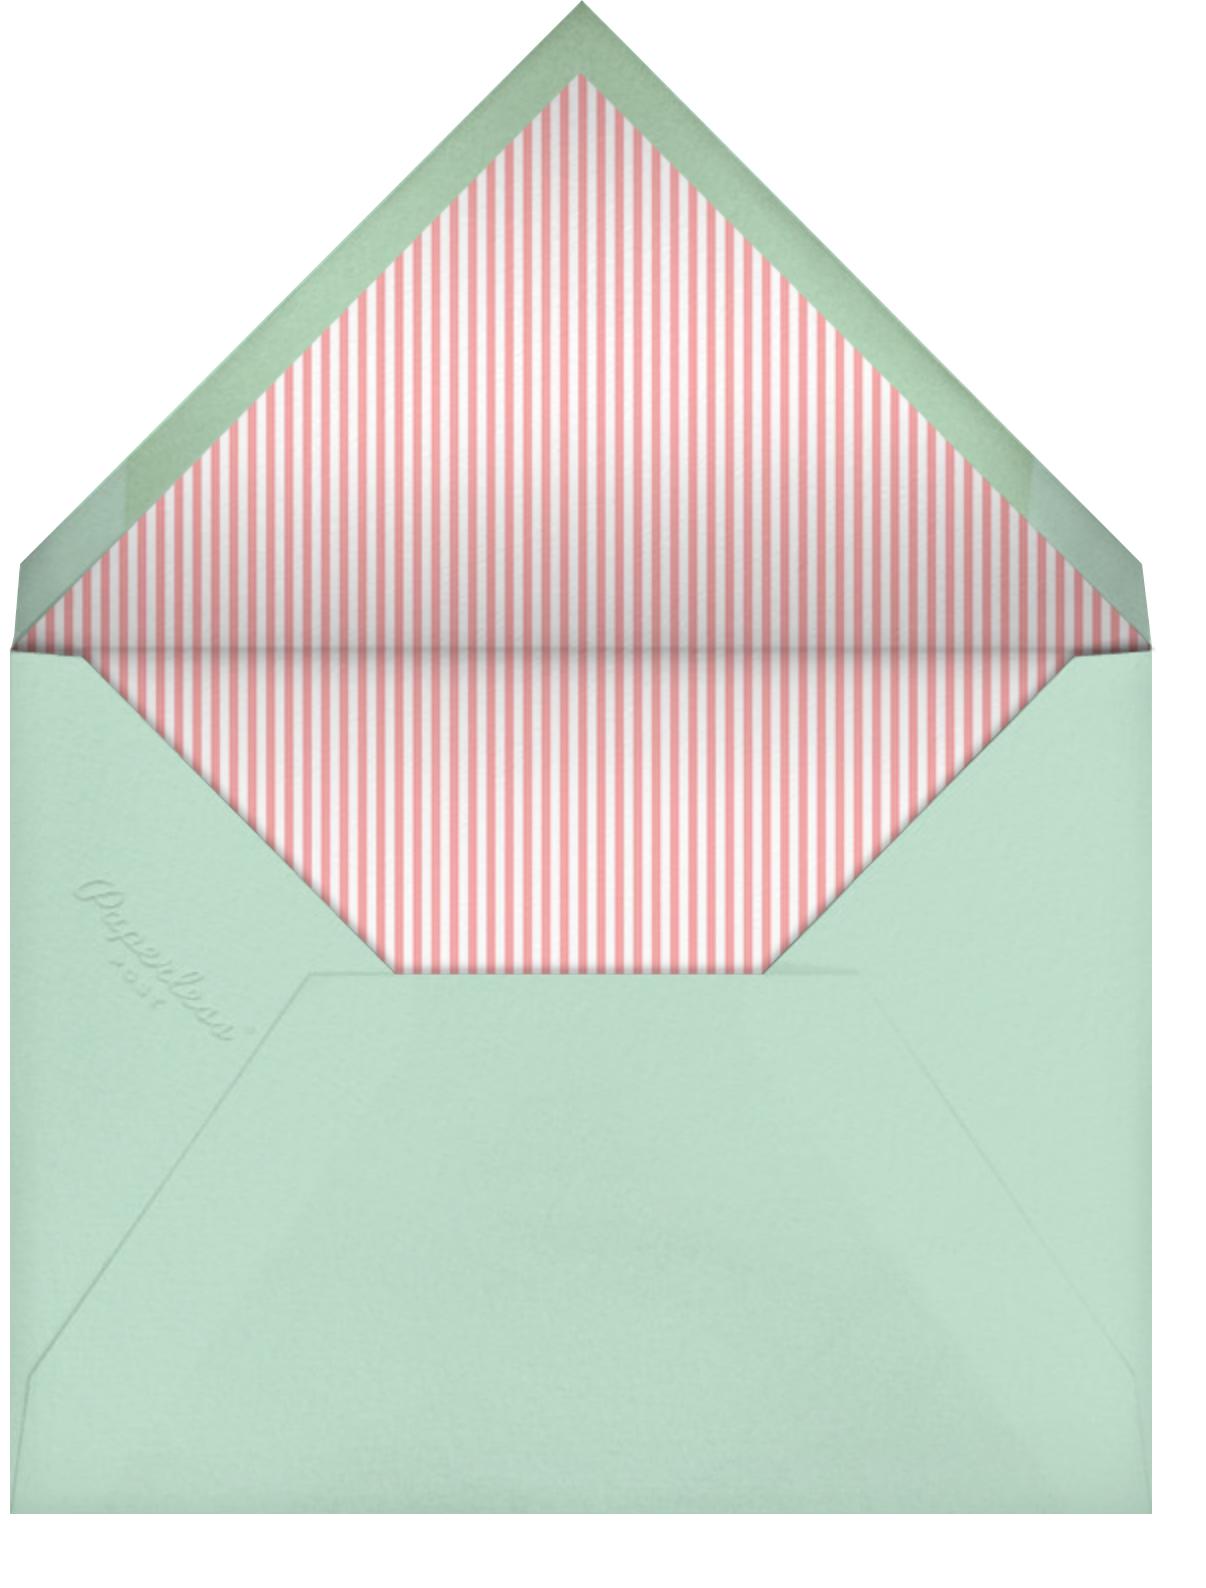 Ellie's Party - Blossom - Little Cube - Baby shower - envelope back